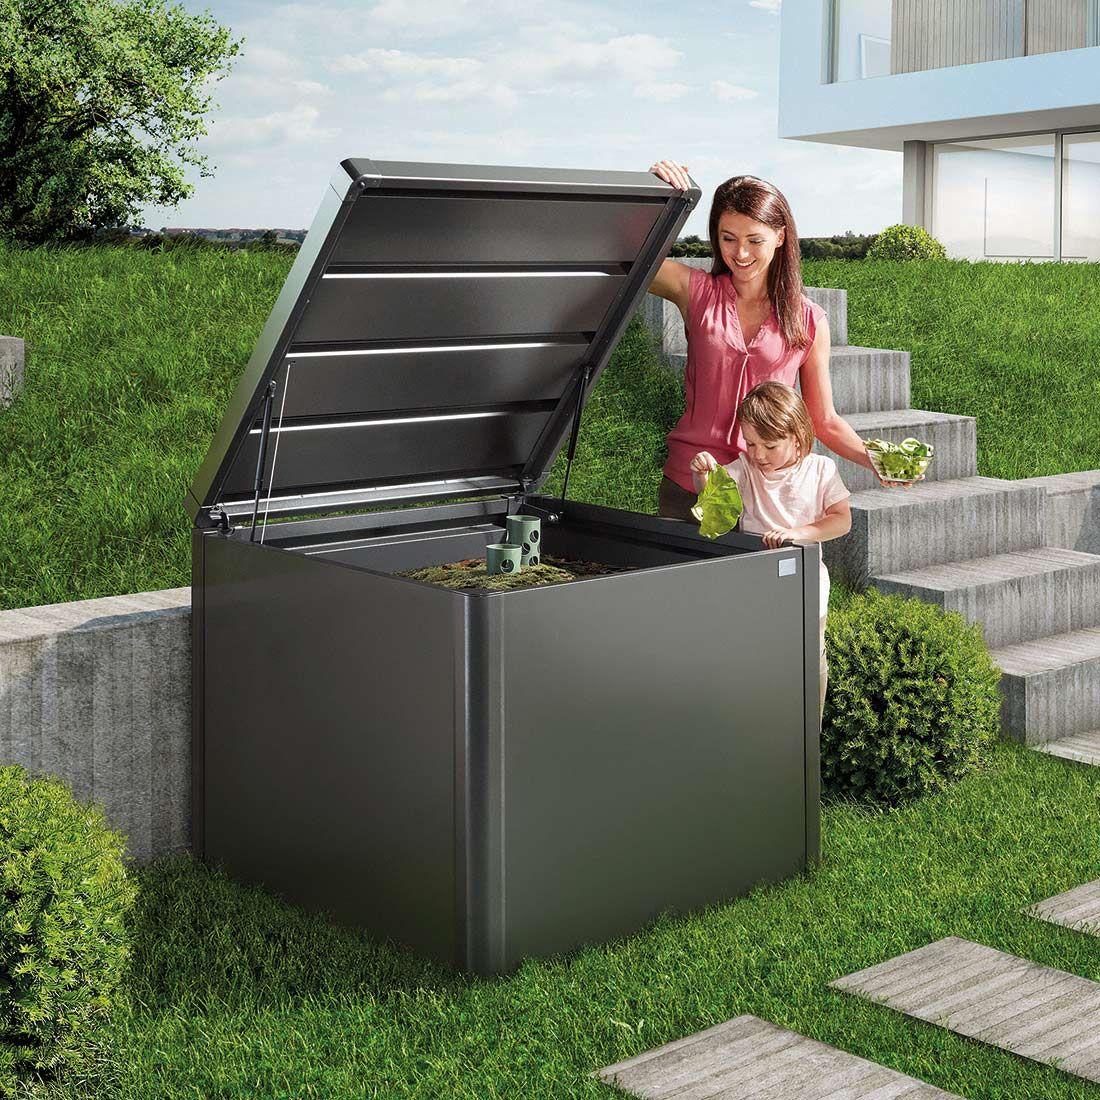 Biohort Komposter Monami Biohort Kompost Hochbeet